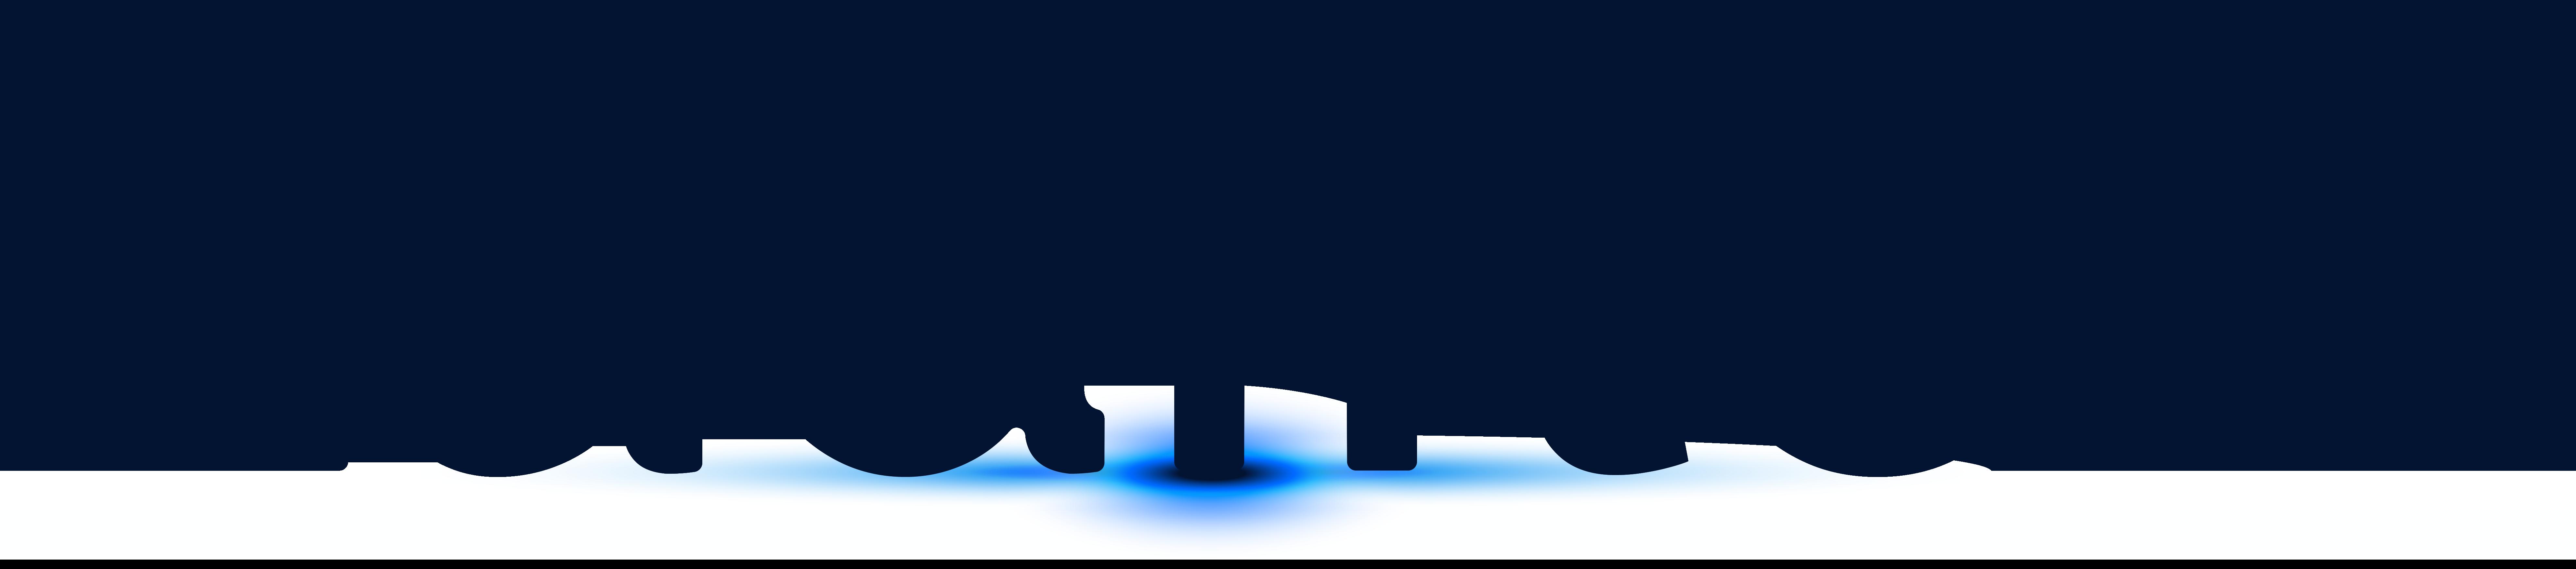 Radiflow Revolutionizes Industrial Cybersecurity With New Version of CIARA – OT Risk Platform